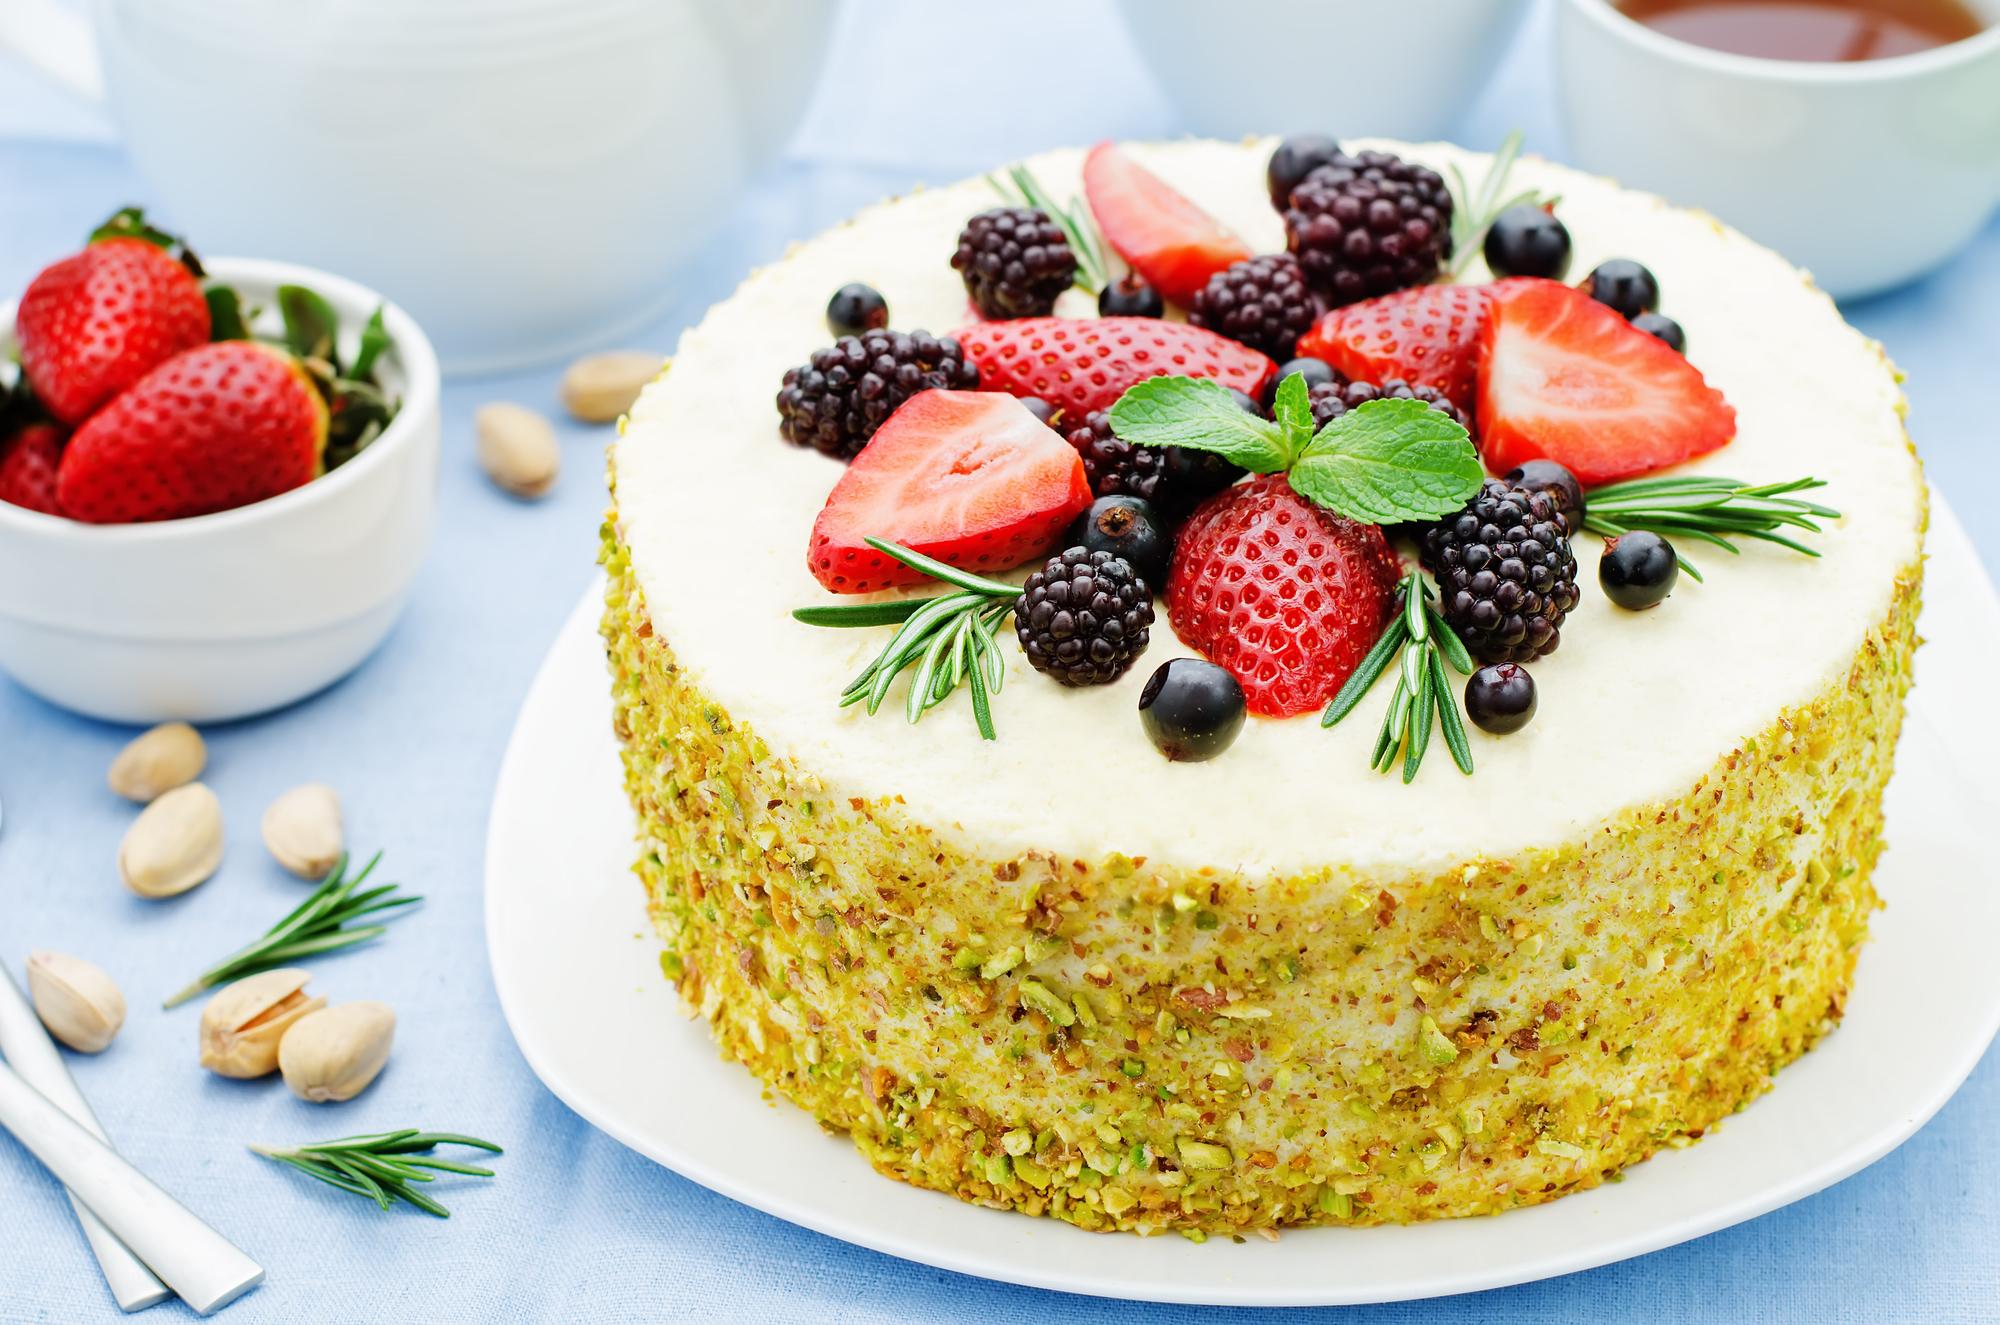 Gluten free dairy free pistachio cake recipe